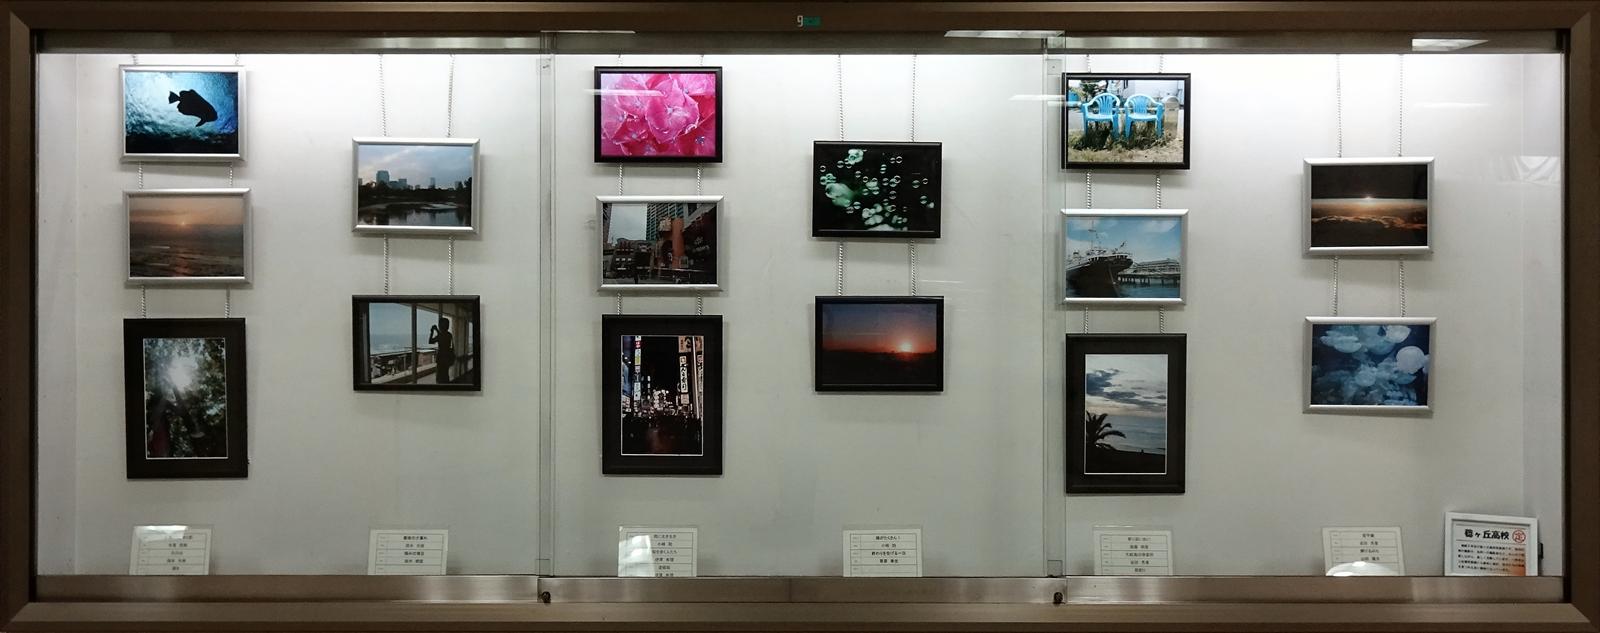 稔ヶ丘高校(20160206)